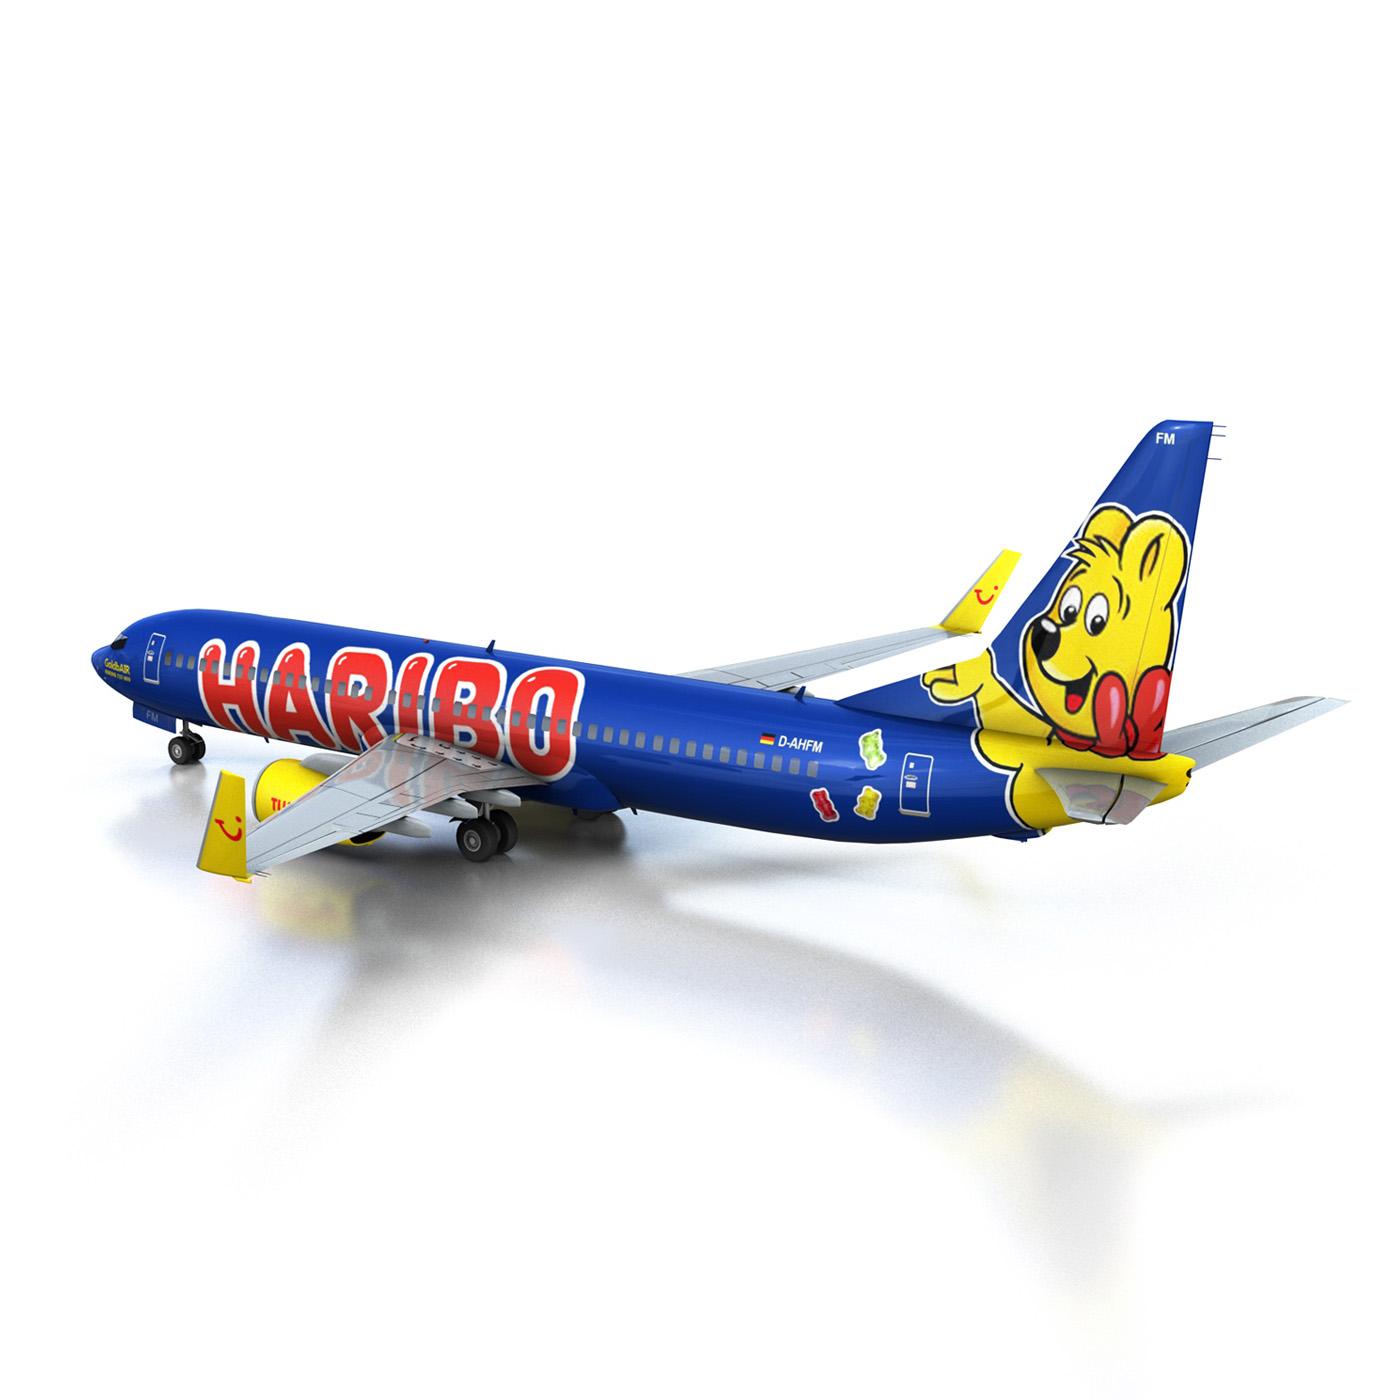 boeing 737-800 goldbair 3d model 3ds fbx c4d lwo obj 293495